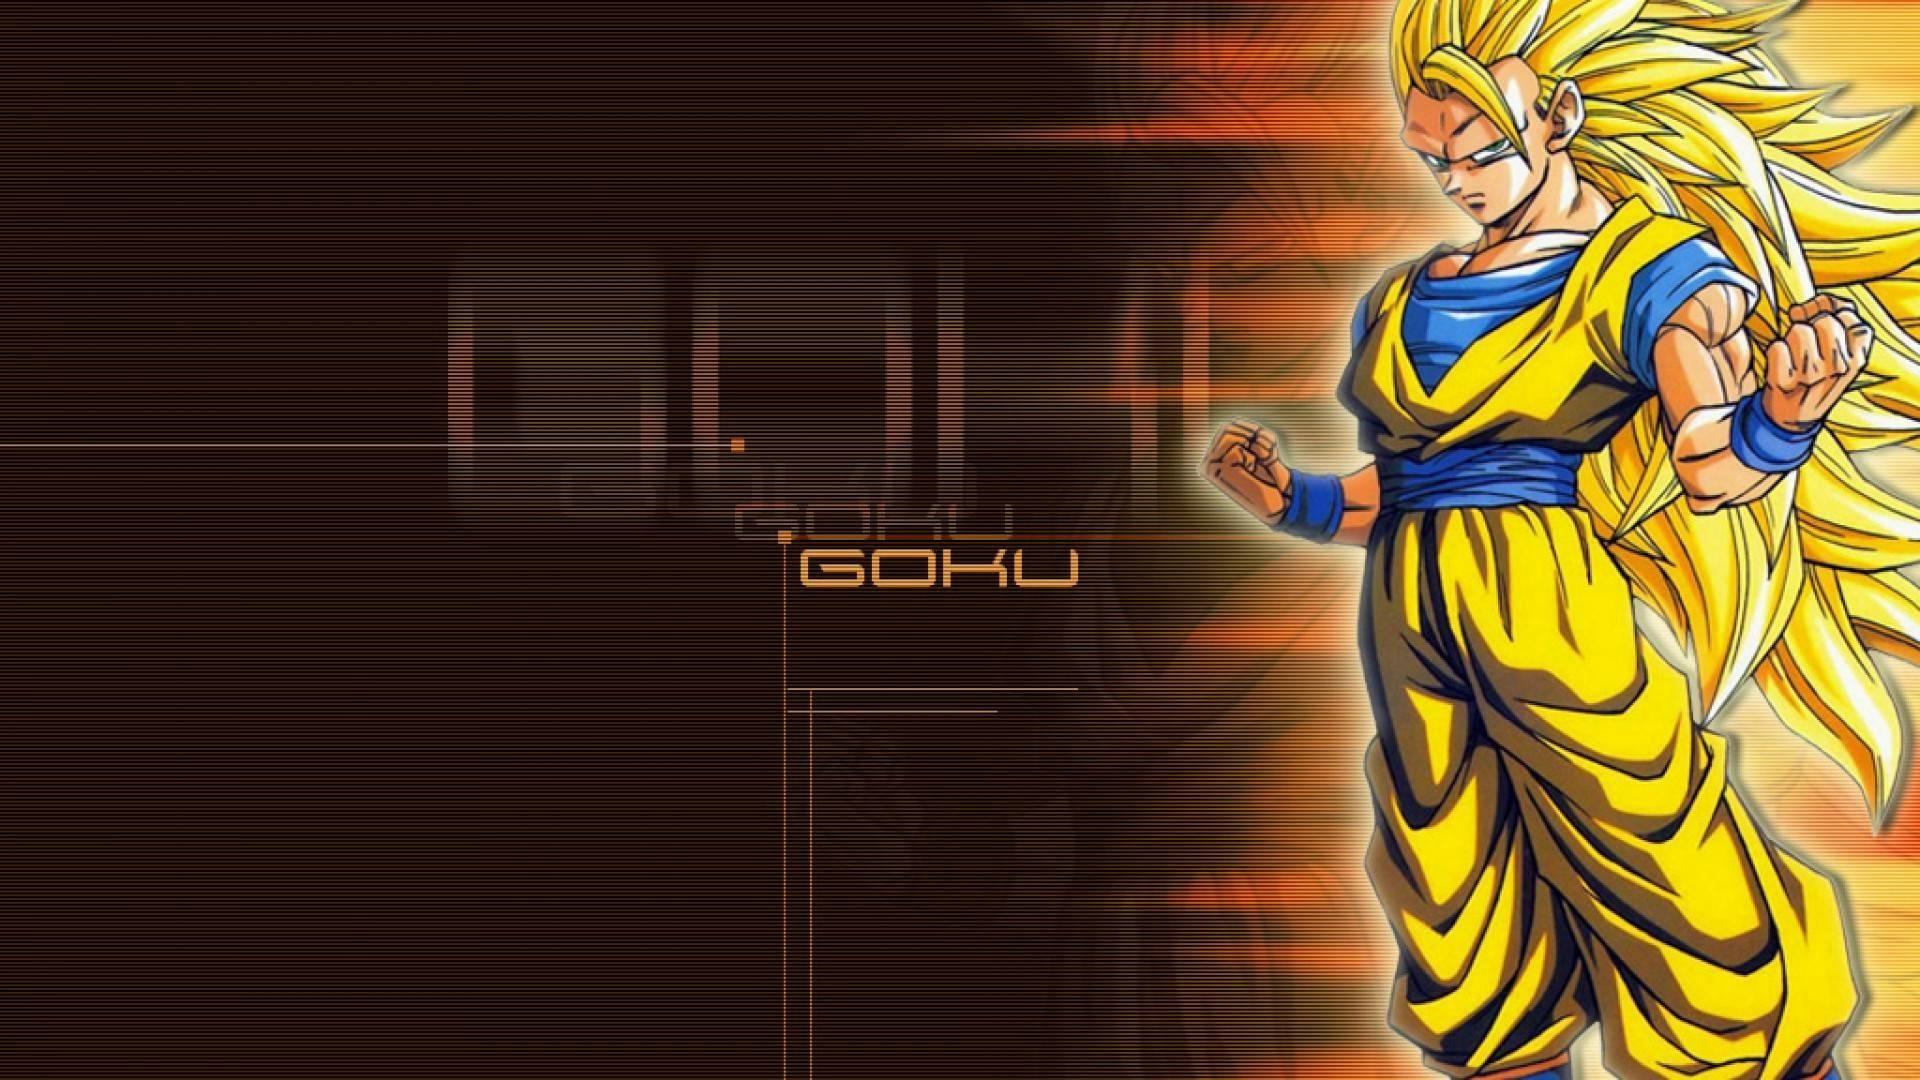 wallpaper.wiki-Goku-Dragon-Ball-Z-Photo-HD-